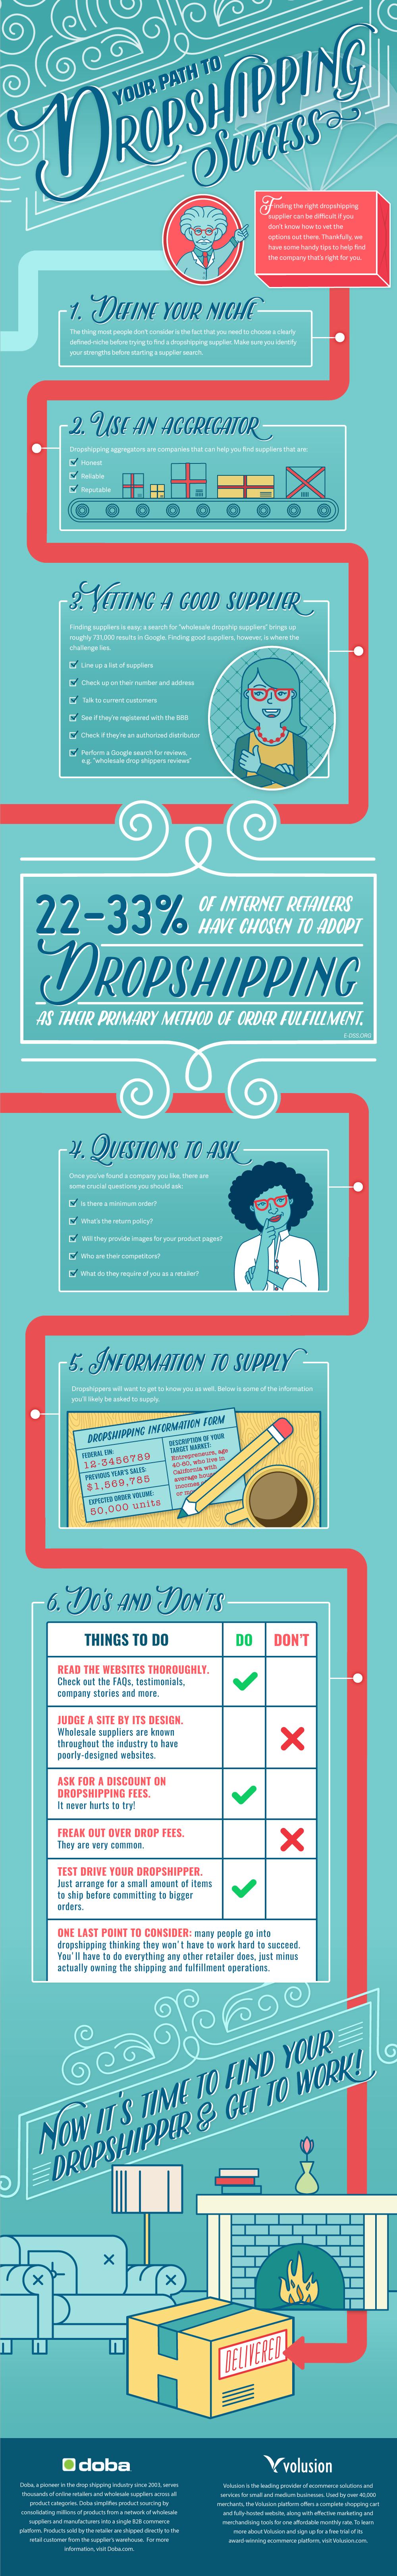 Droppshipping_Infographic_FINAL.jpg